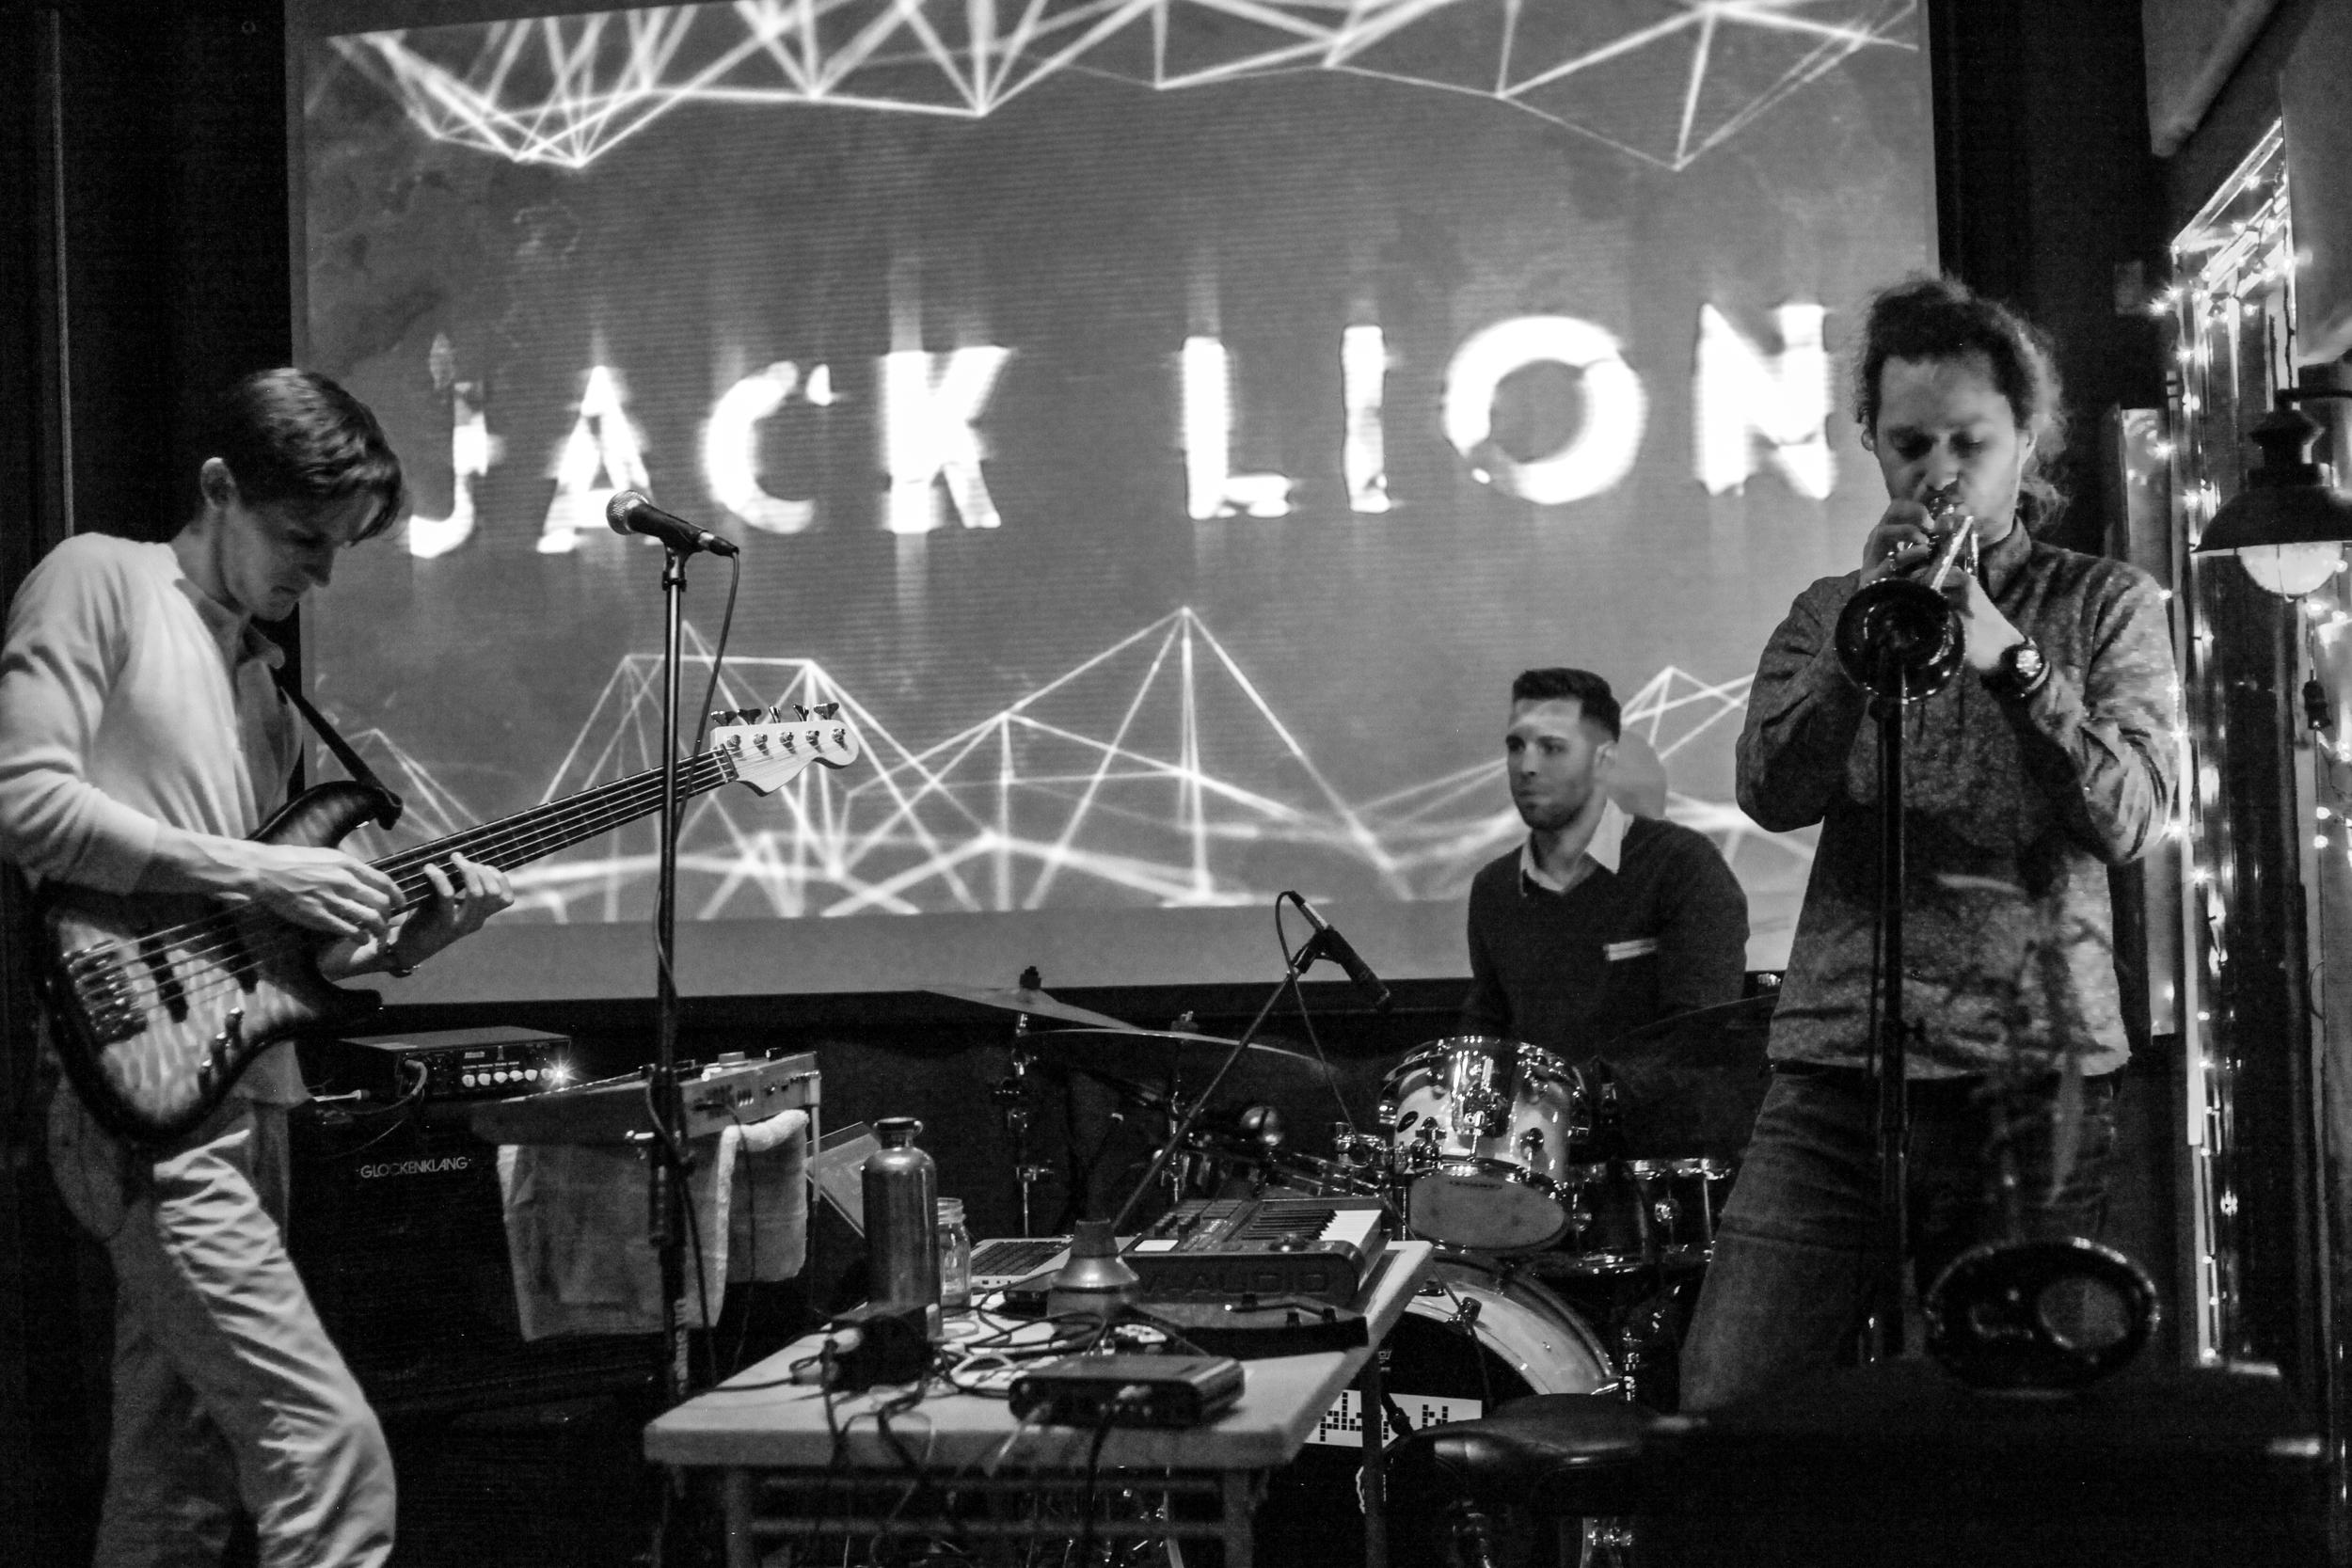 Jack Lion High Resolution